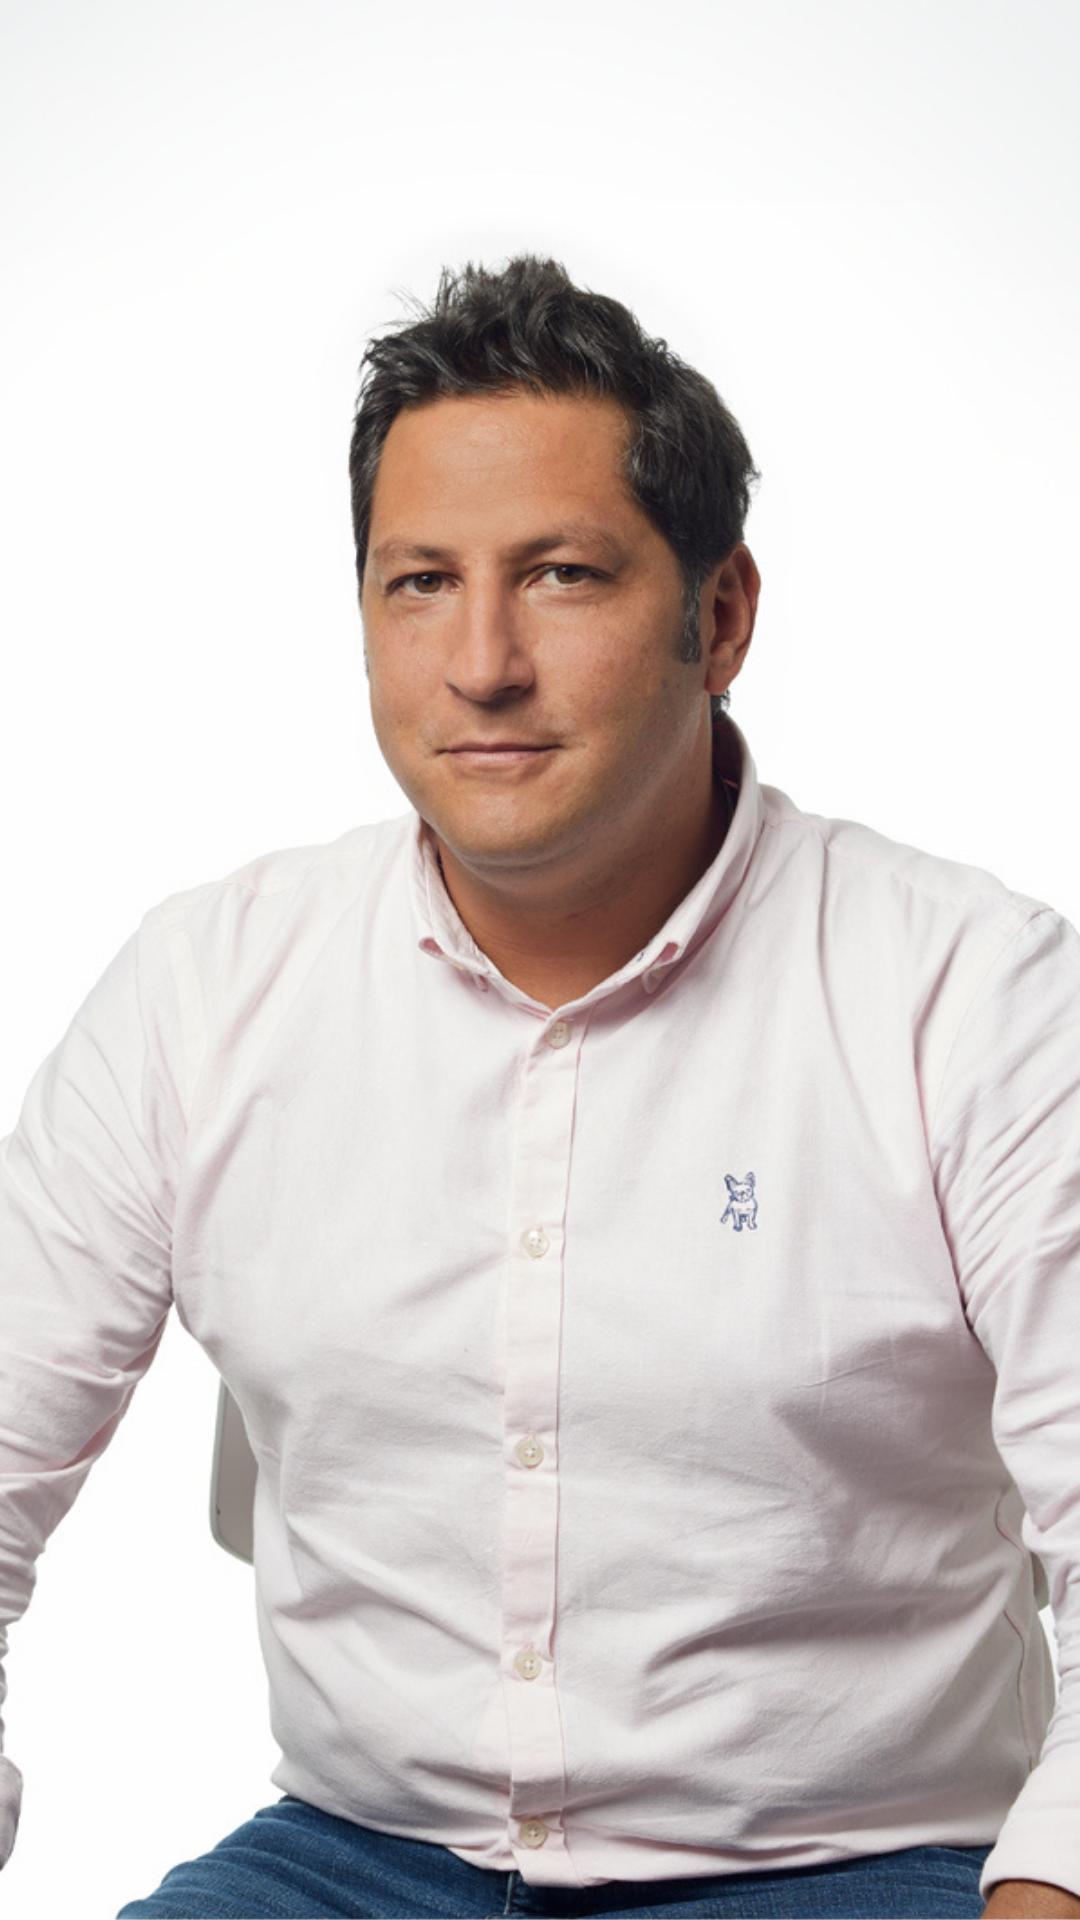 CARLOS AGUAYO VENTURA